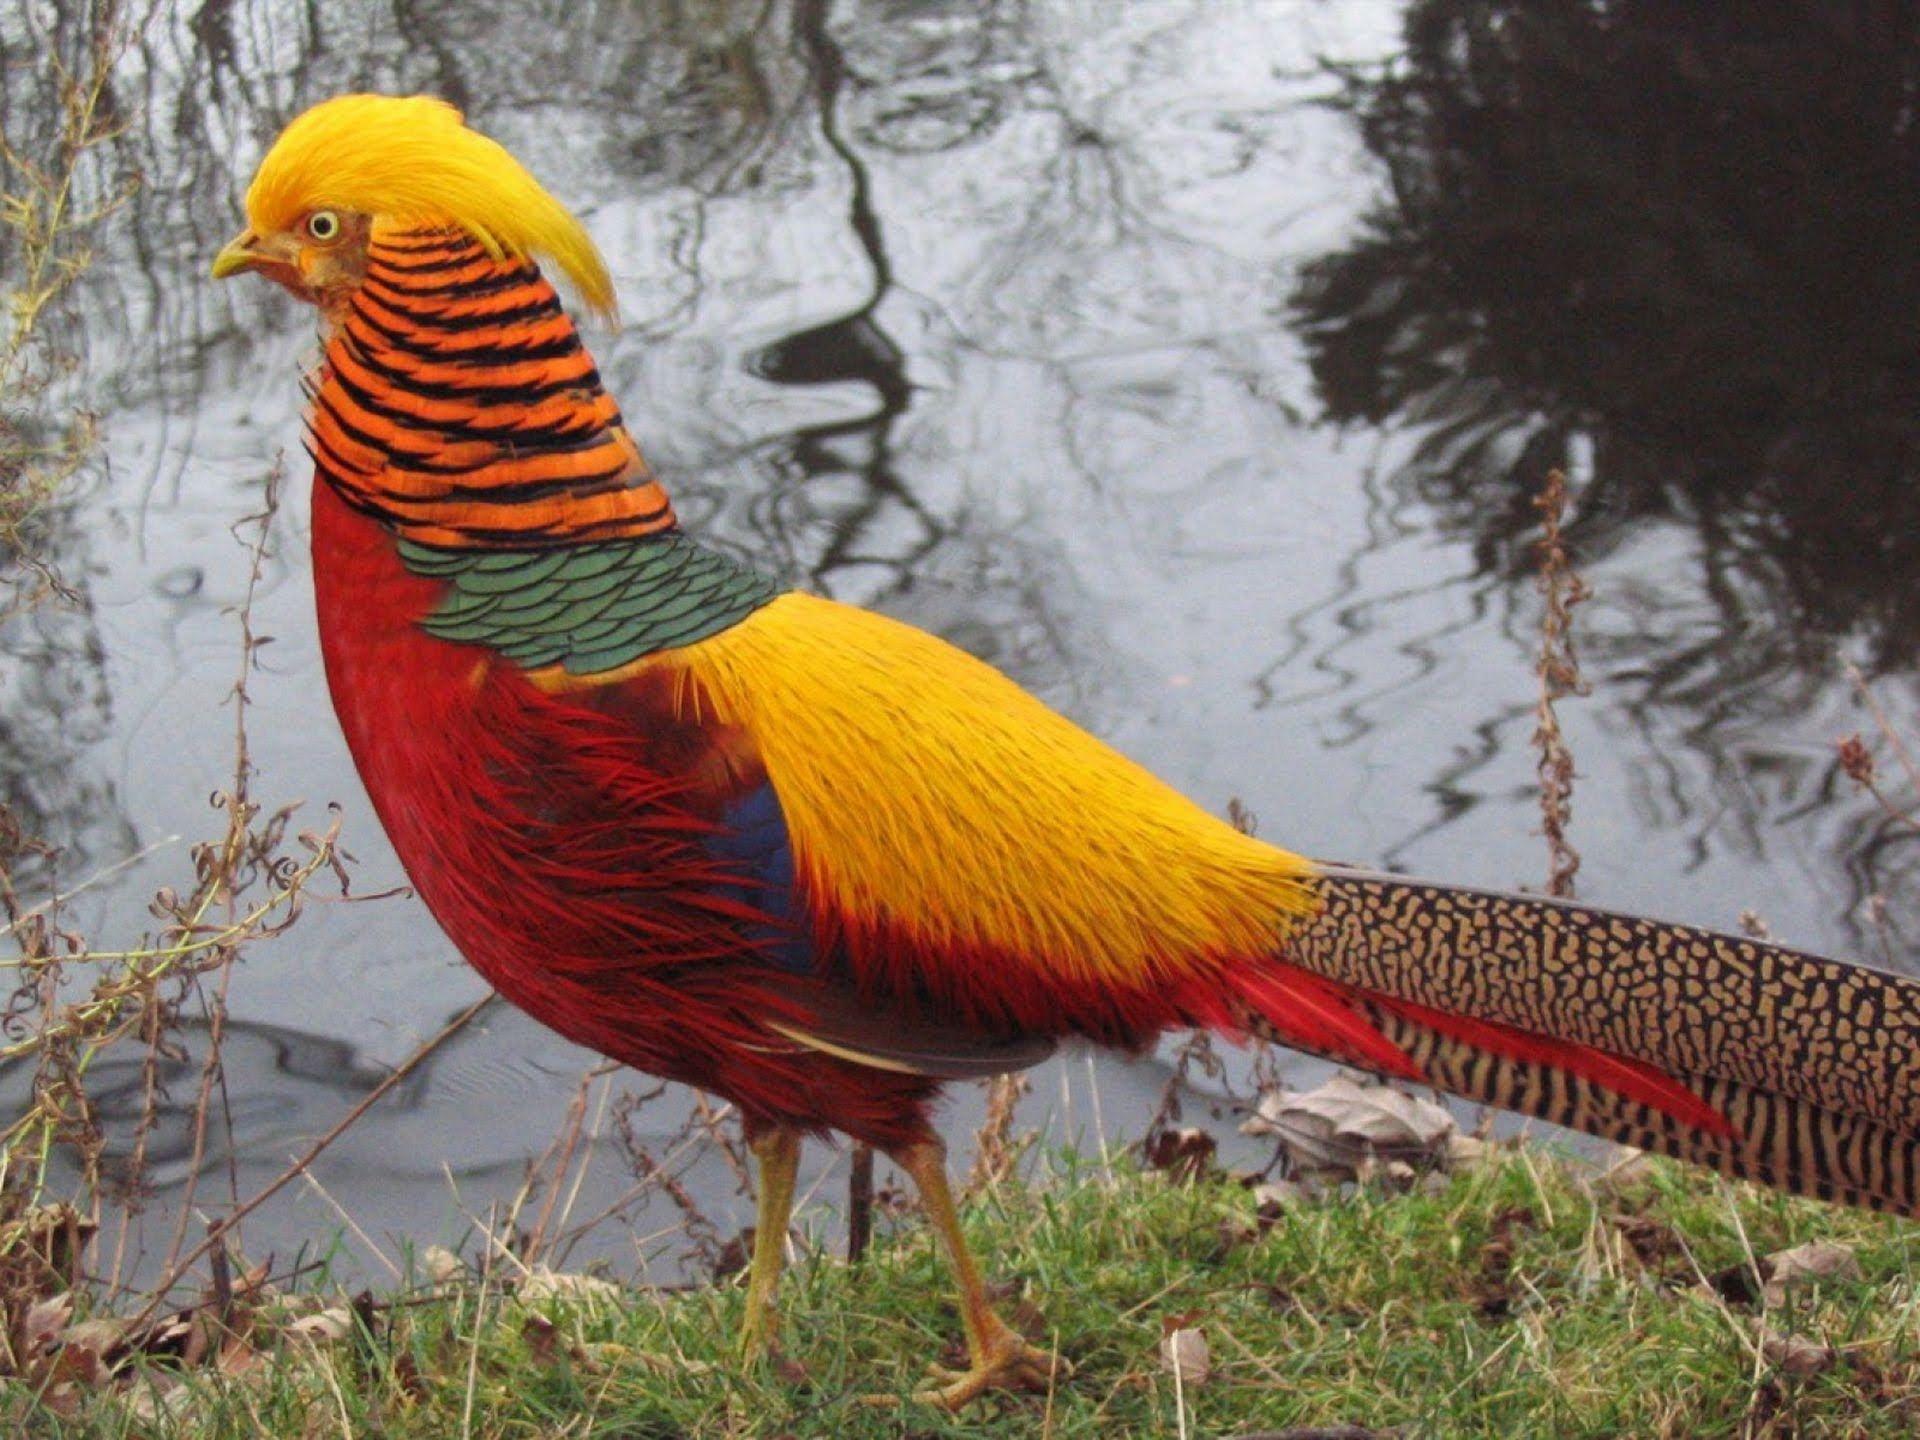 Pheasants age